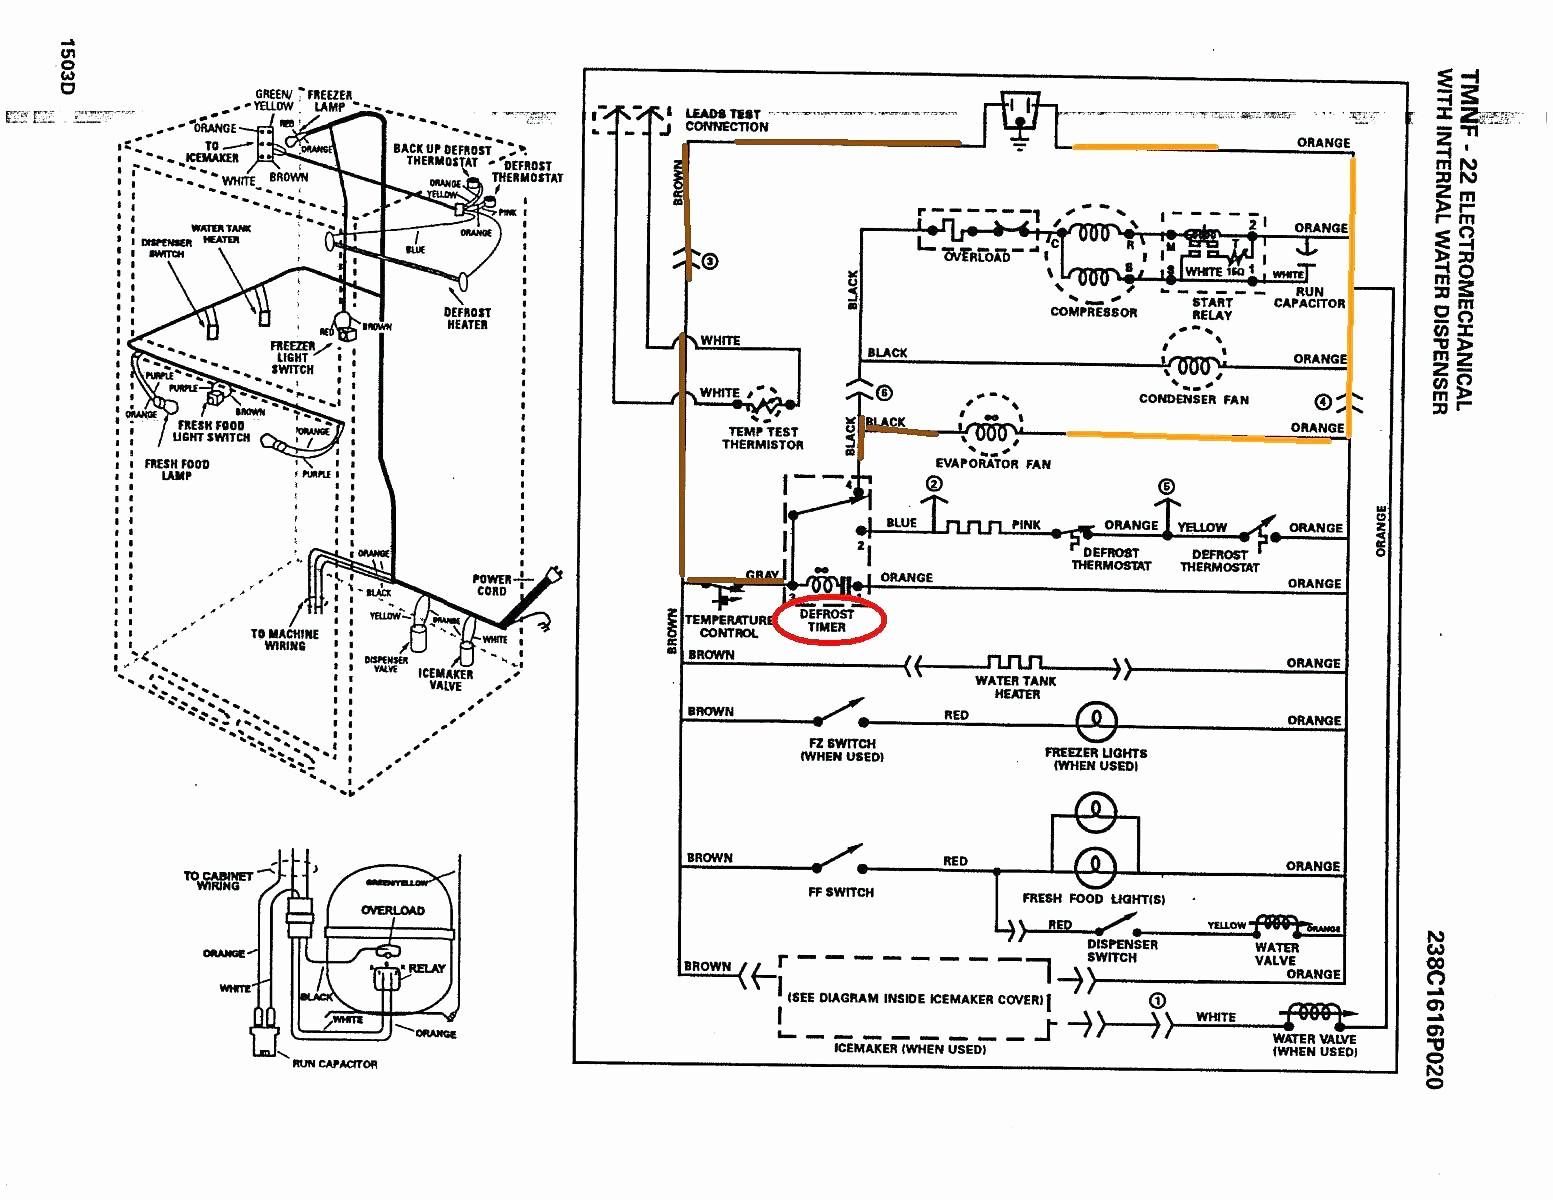 cooler wiring diagram as well vw bus wiring diagram on t s diagram rh koloewrty co Wiring